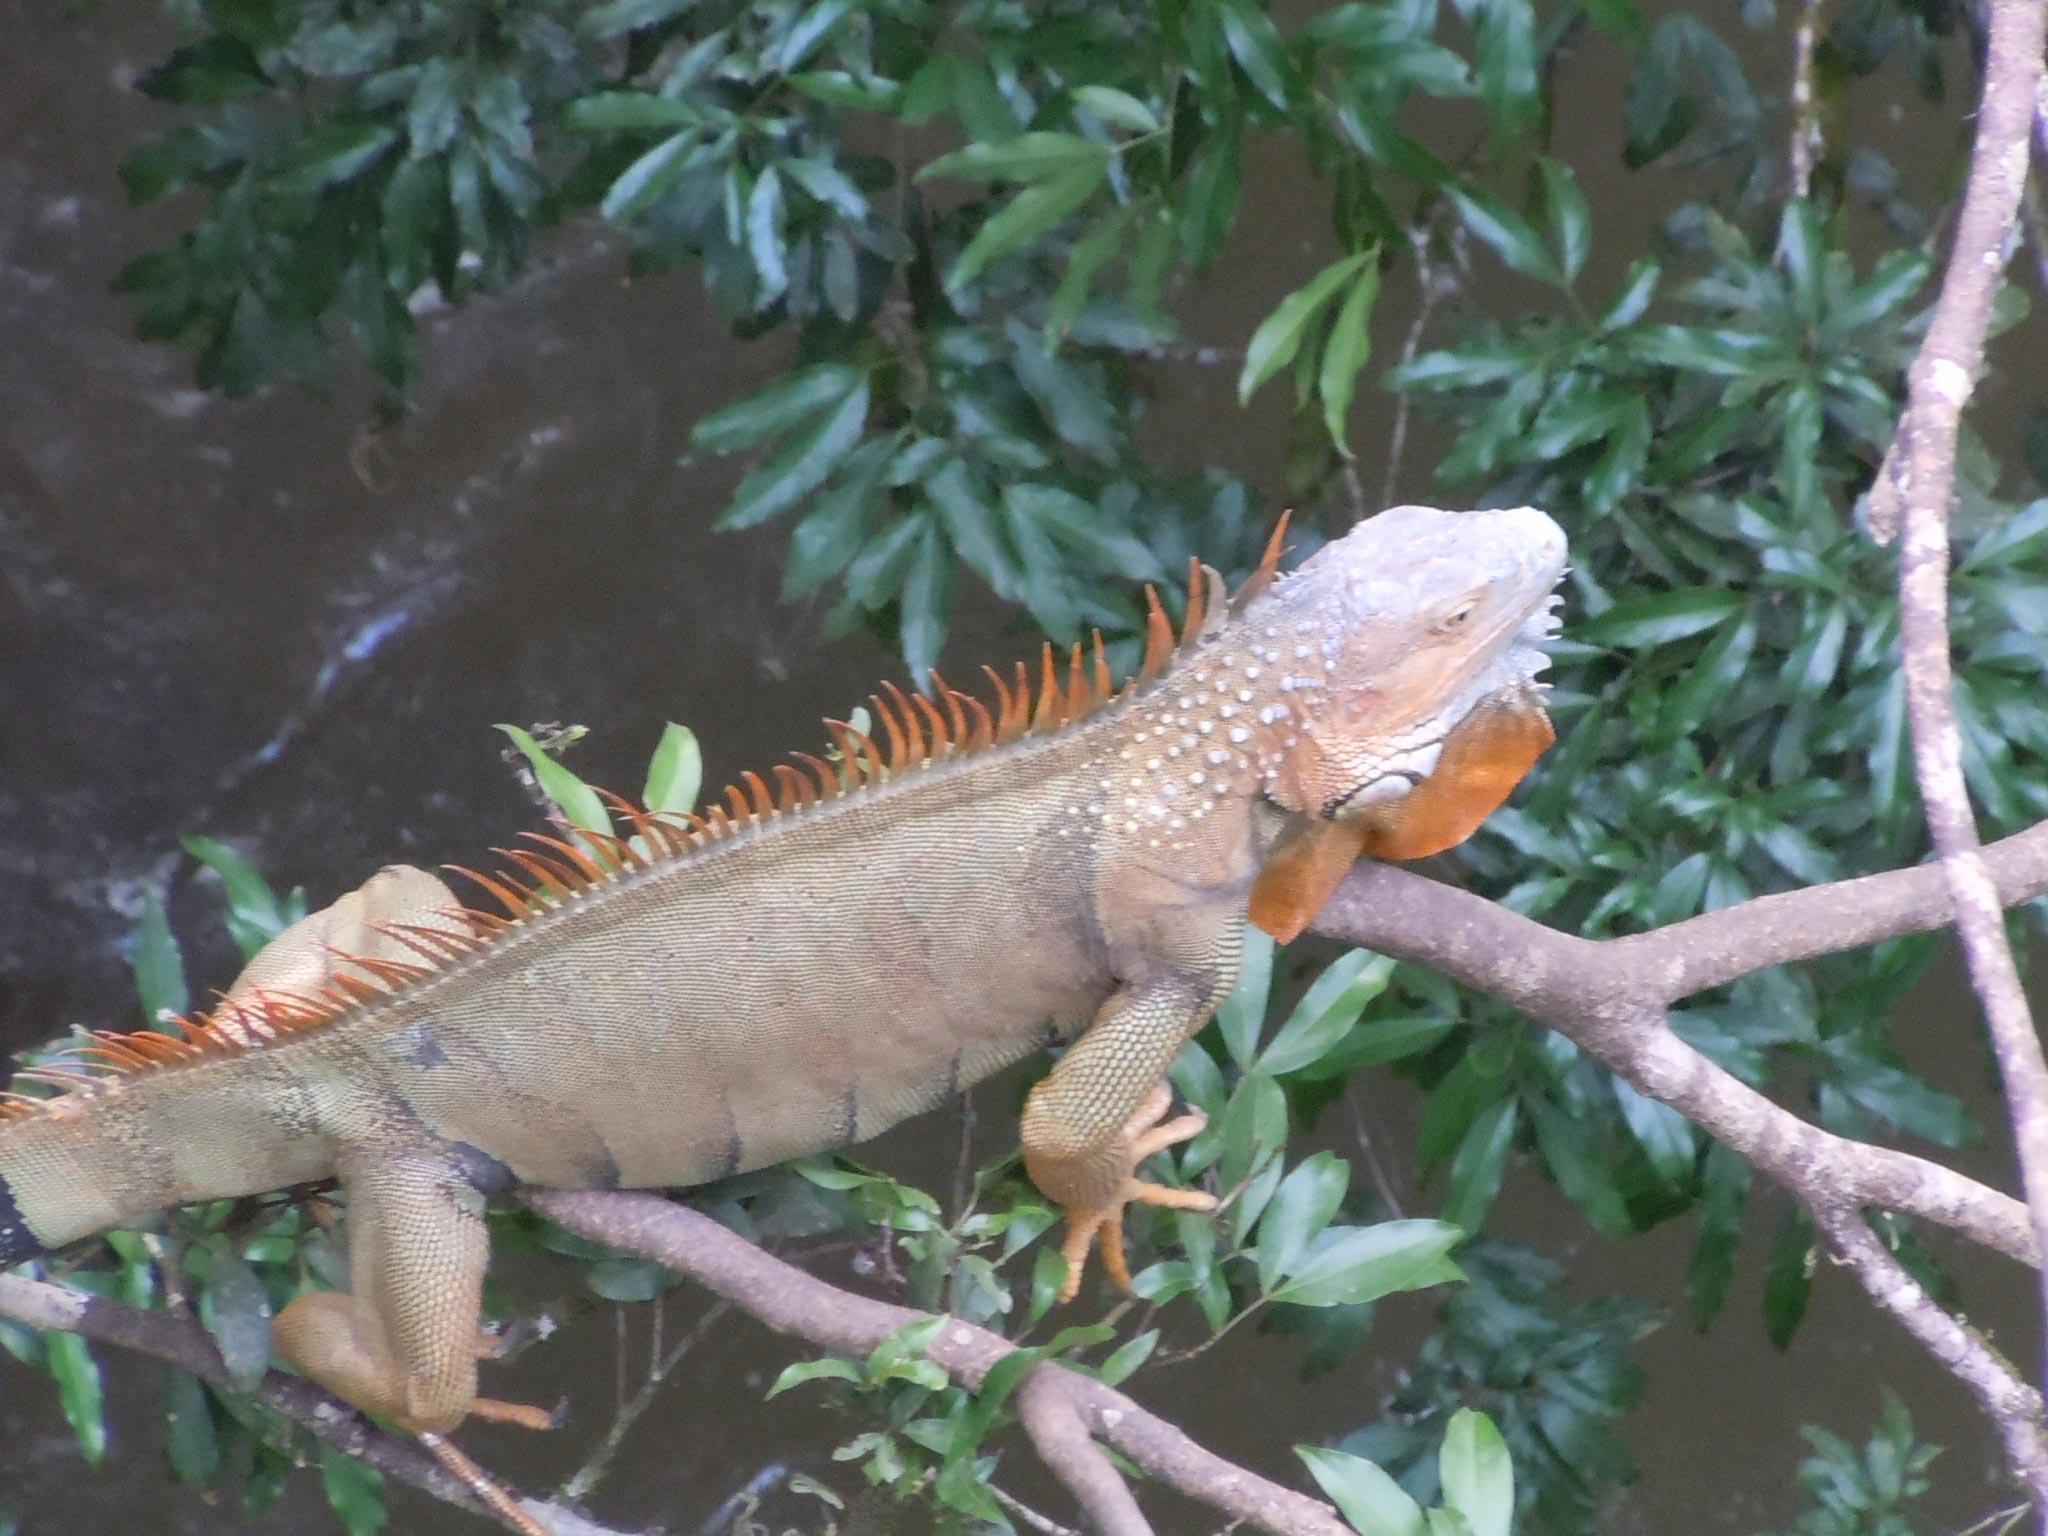 harmless iguana resting in a tree